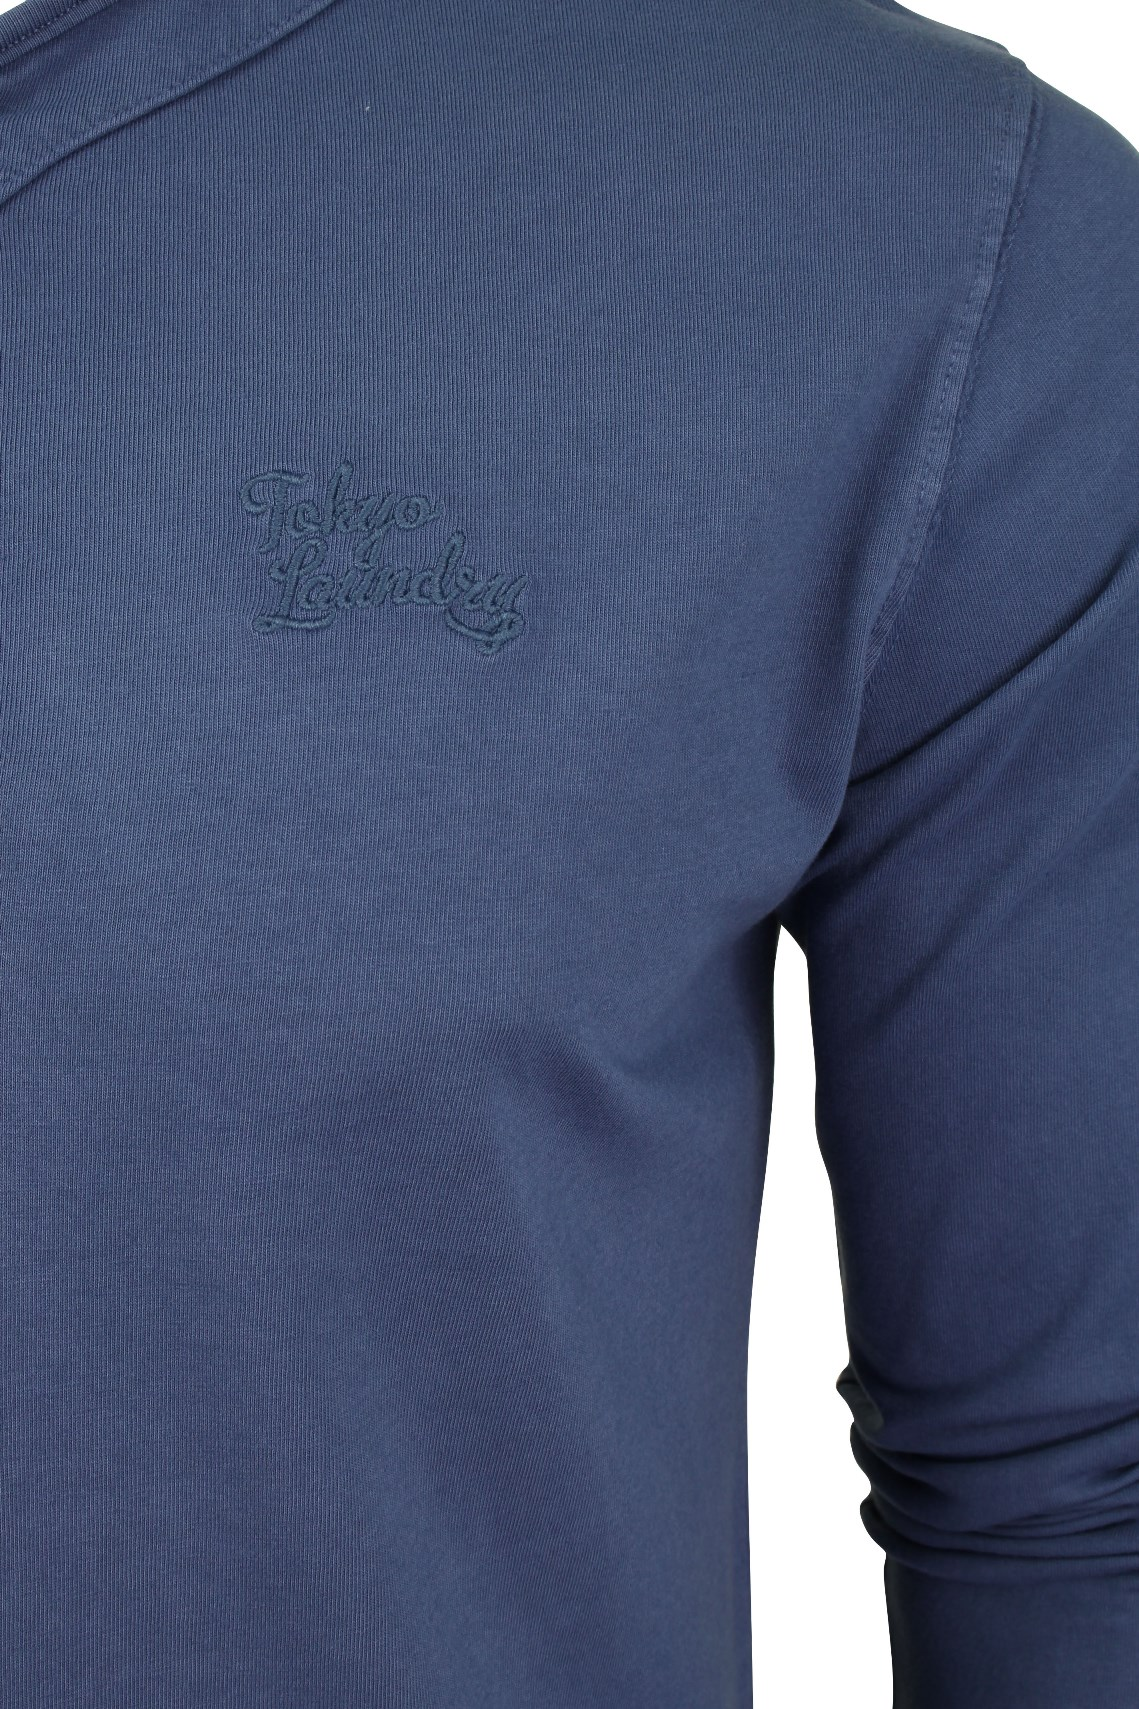 Mens-Grandad-T-Shirt-by-Tokyo-Laundry-039-Winter-Pines-039-Long-Sleeved thumbnail 7